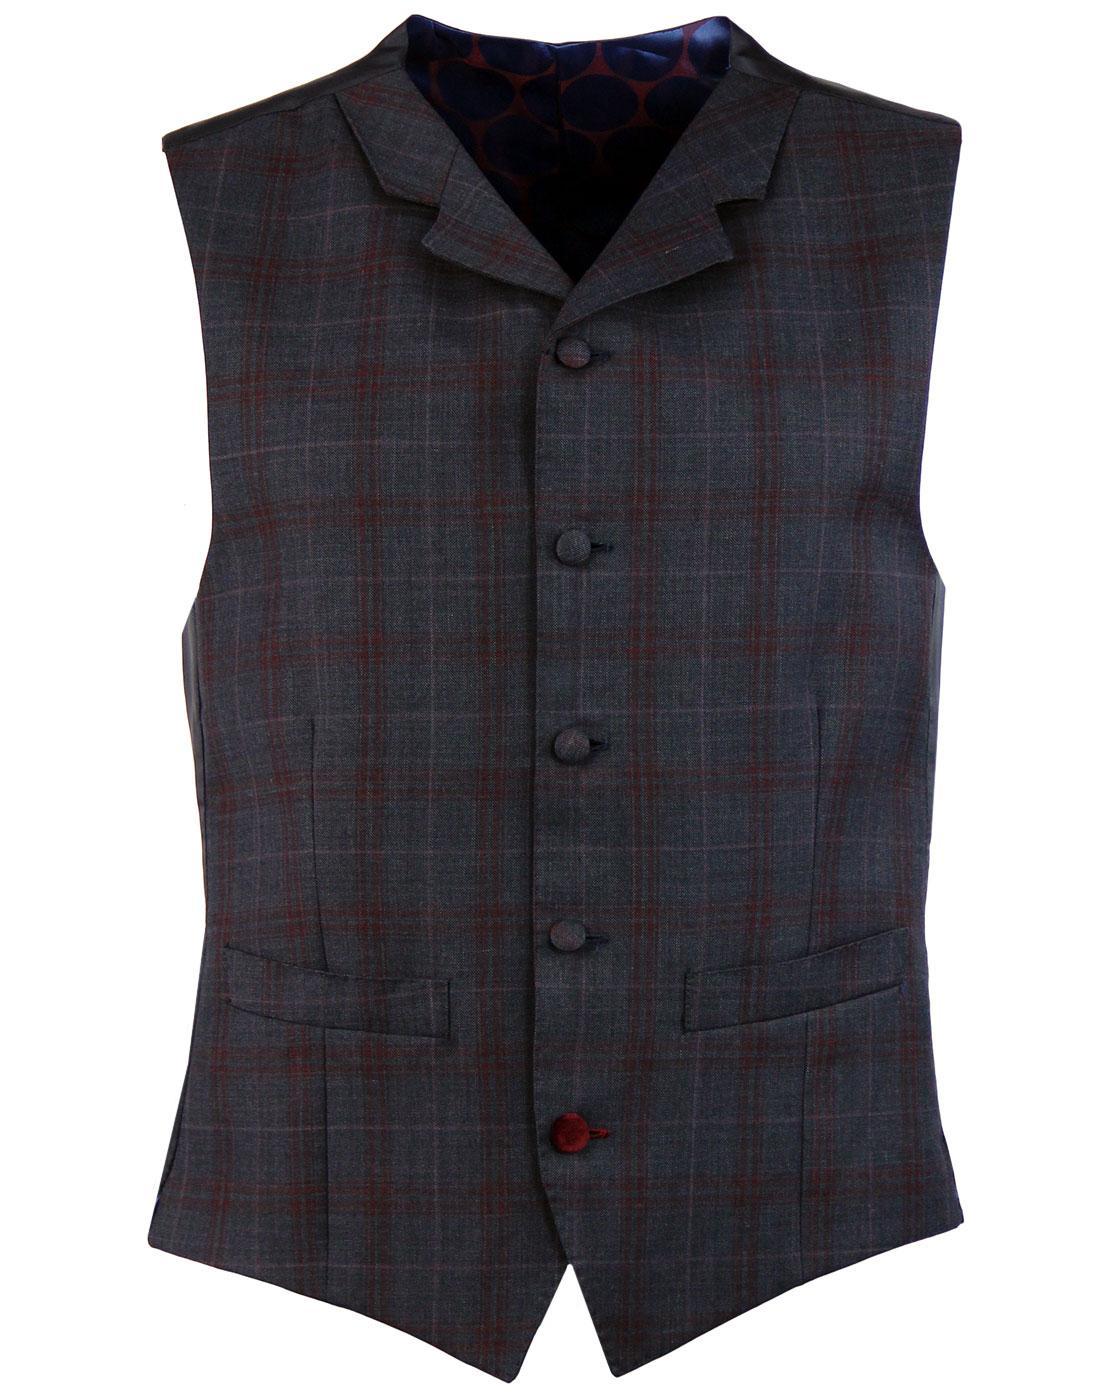 madcap england check high fasten lapel waistcoat